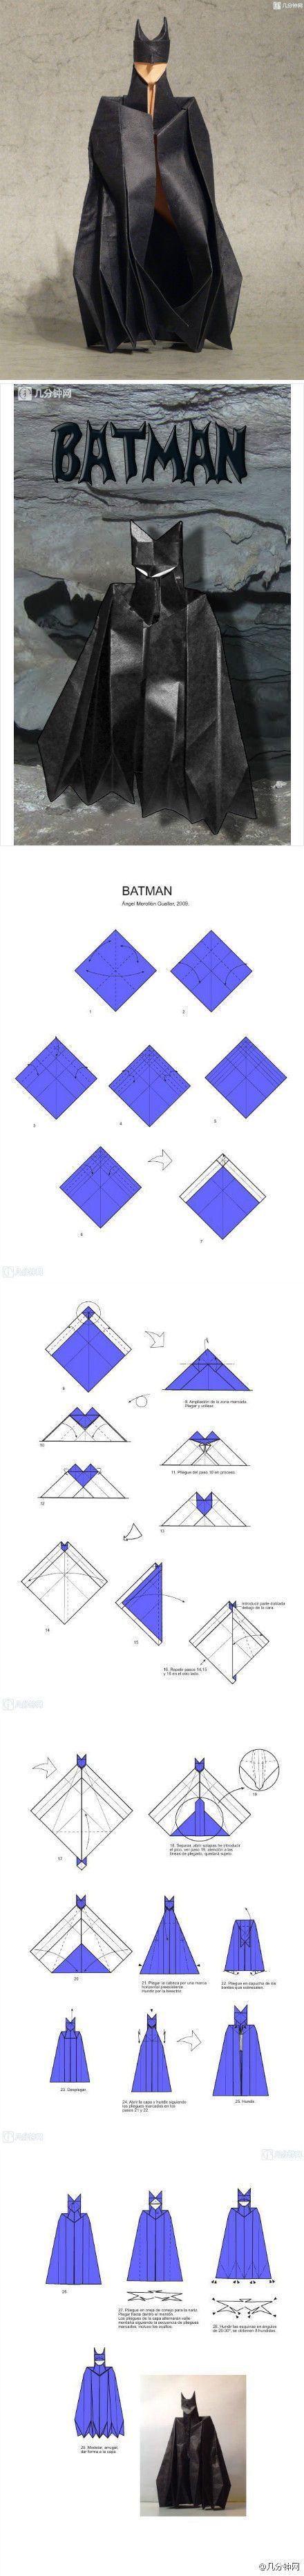 Origami Batman Folding Instructions Instruction On Imgfave Ratrat Origamiorigami Rat Diagram Guide